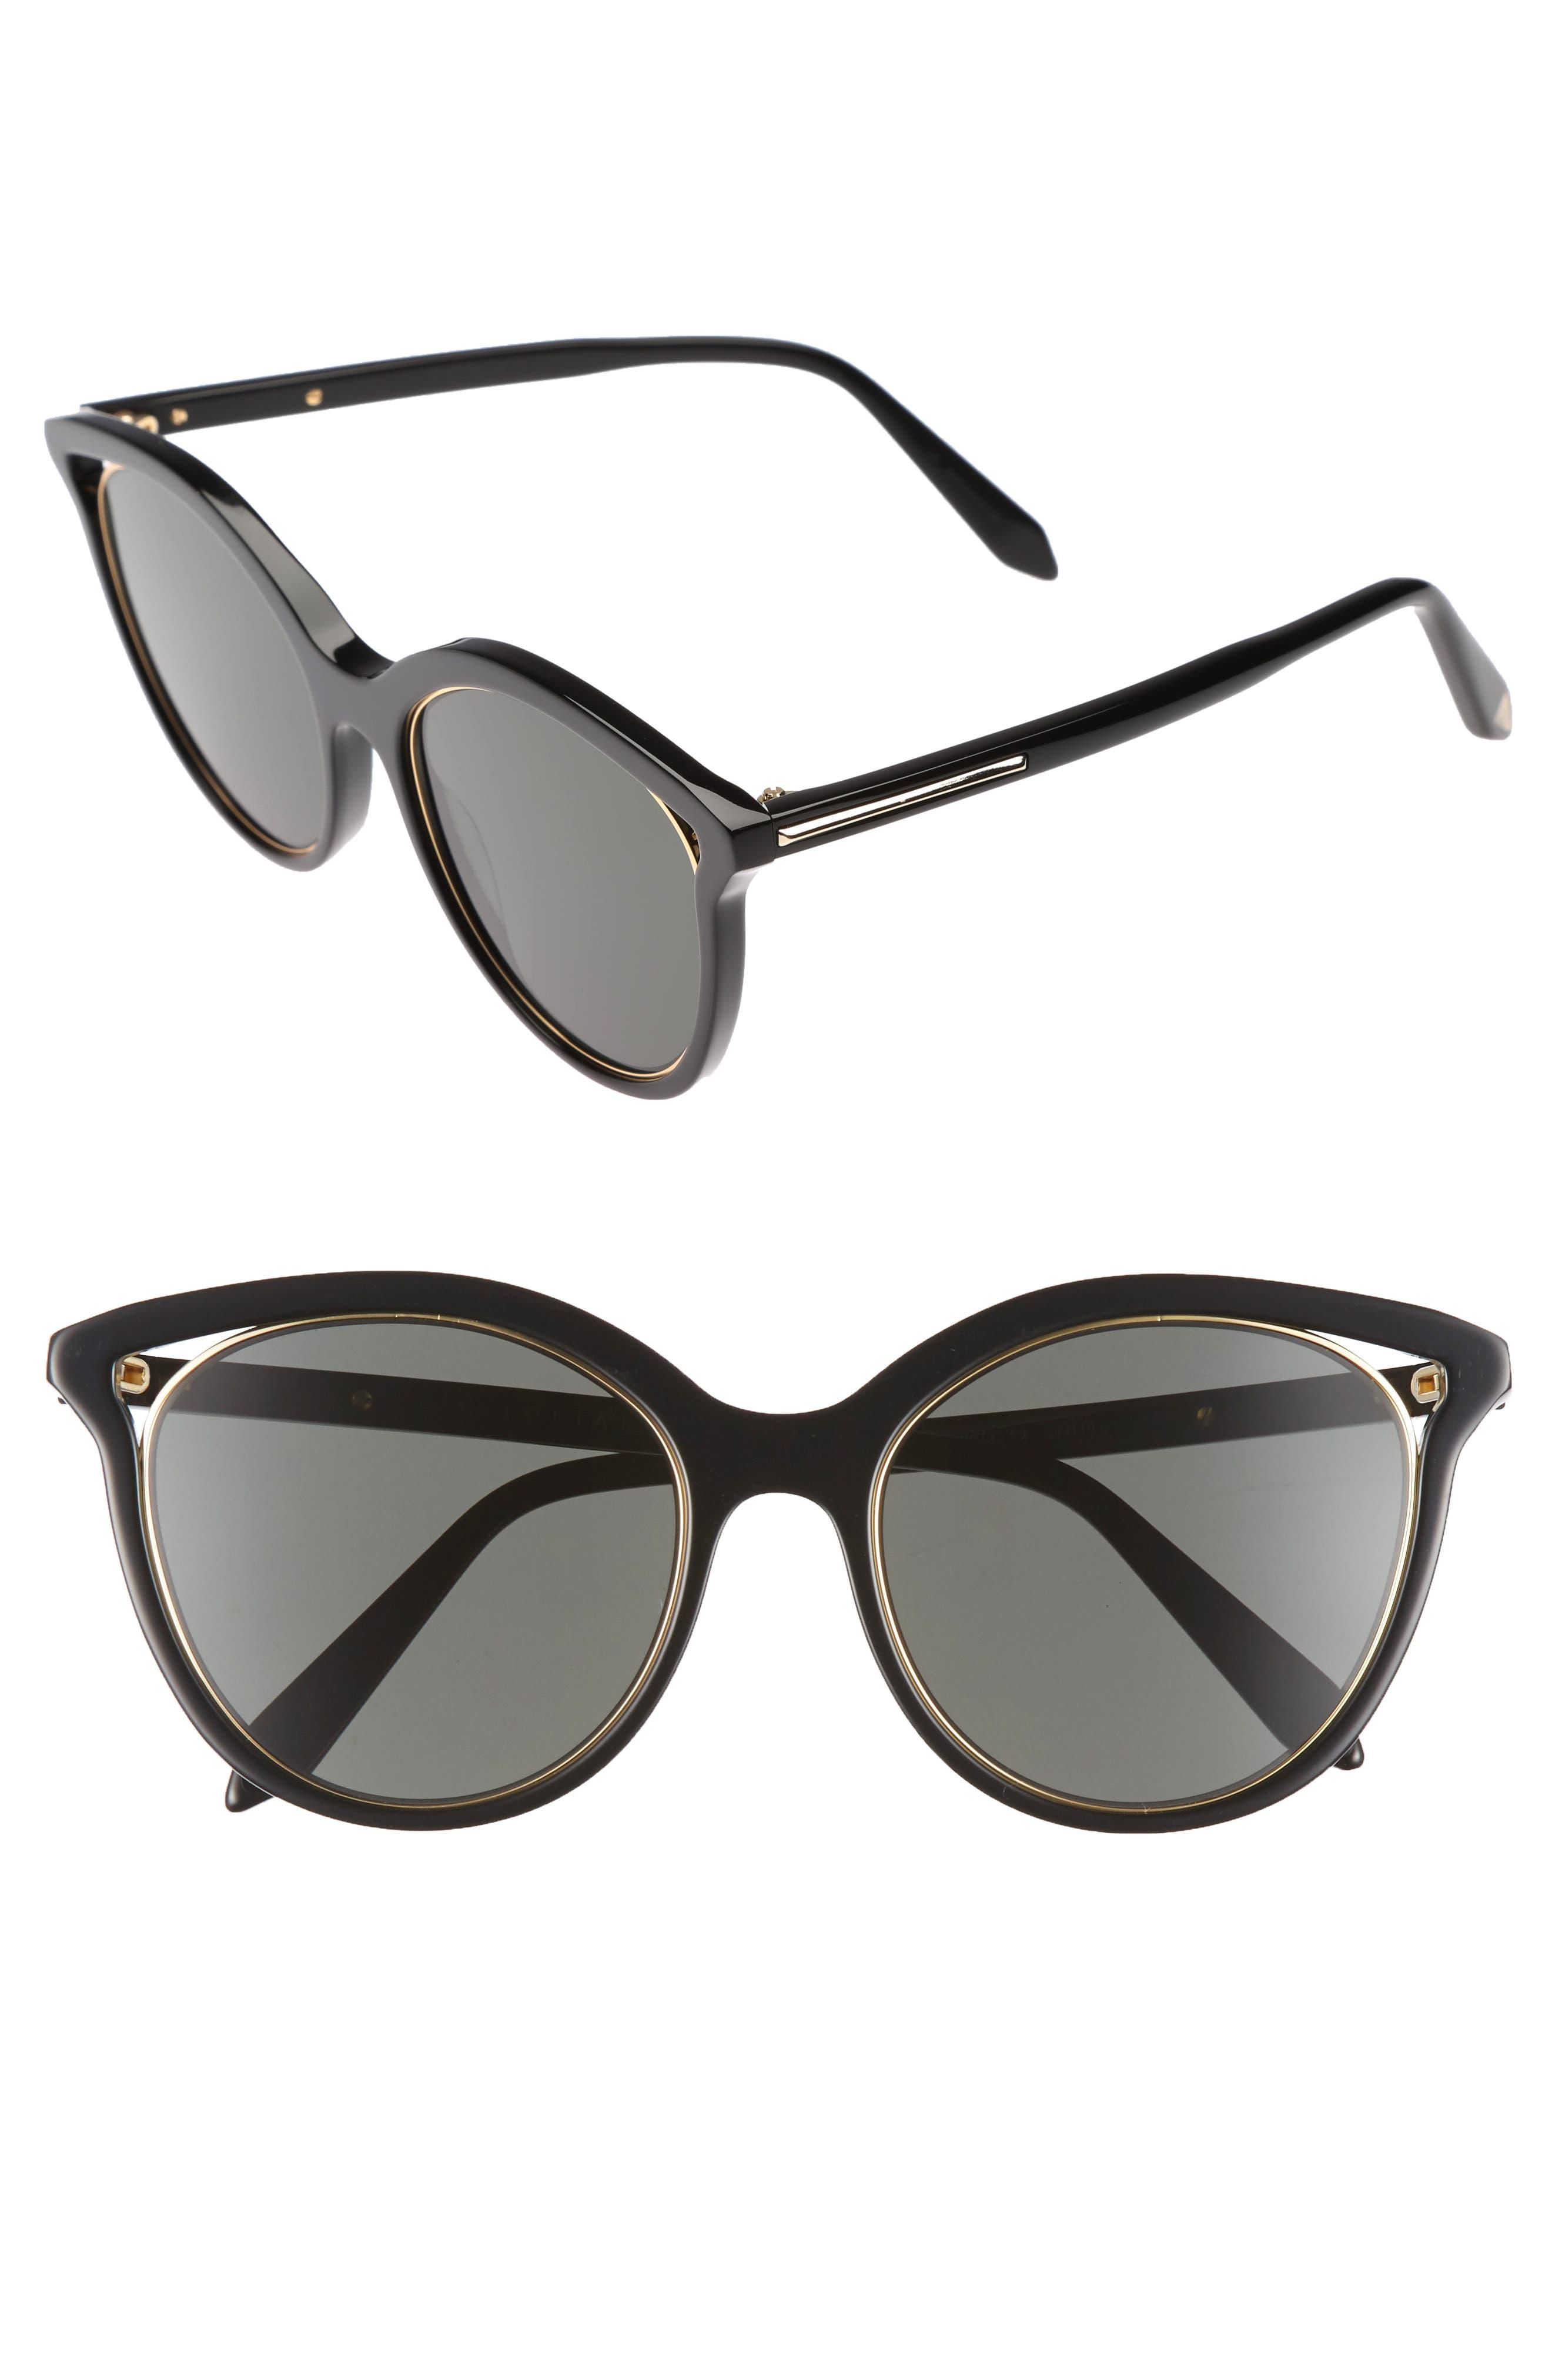 VICTORIA BECKHAM, Cutaway Kitten 54mm Cat Eye Sunglasses, Main thumbnail 1, color, BLACK/ GOLD